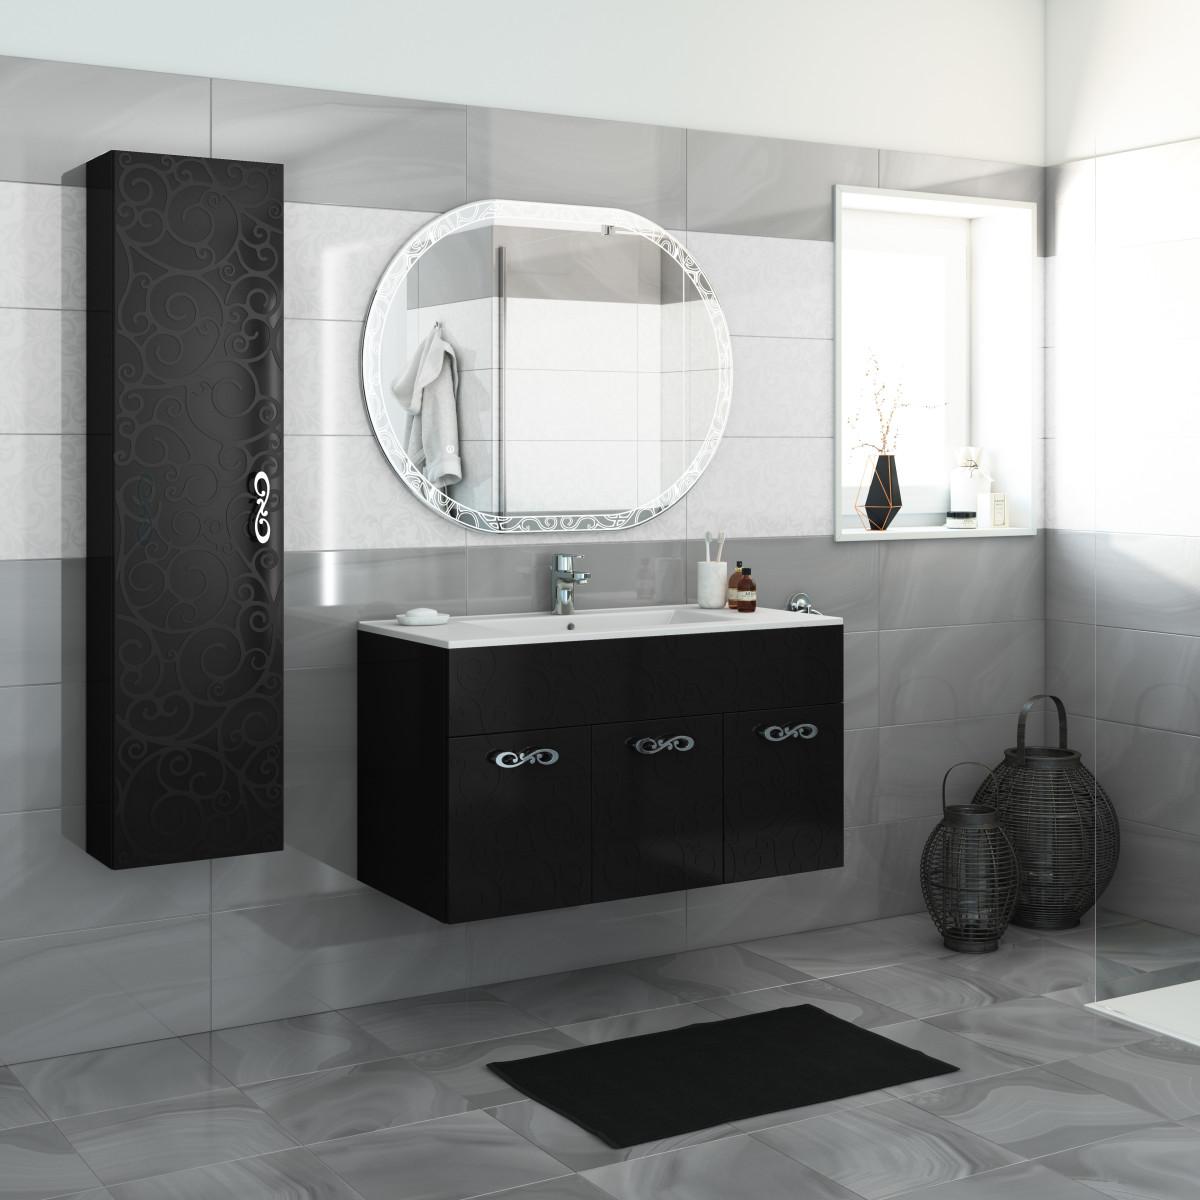 Coprilavatrice ikea - Mobile bagno doppio lavabo leroy merlin ...